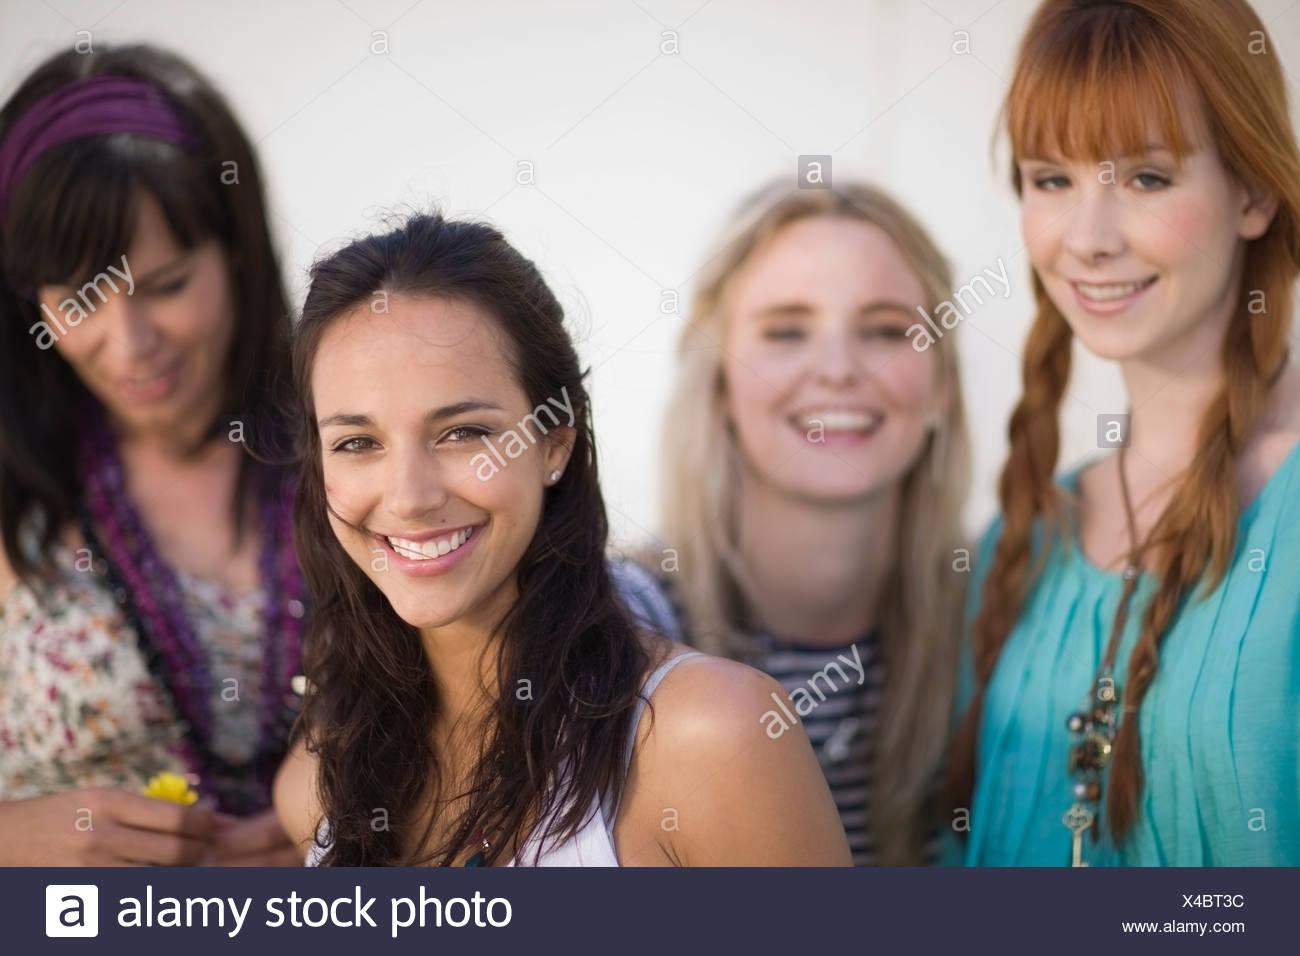 4 Girl friends having fun - Stock Image